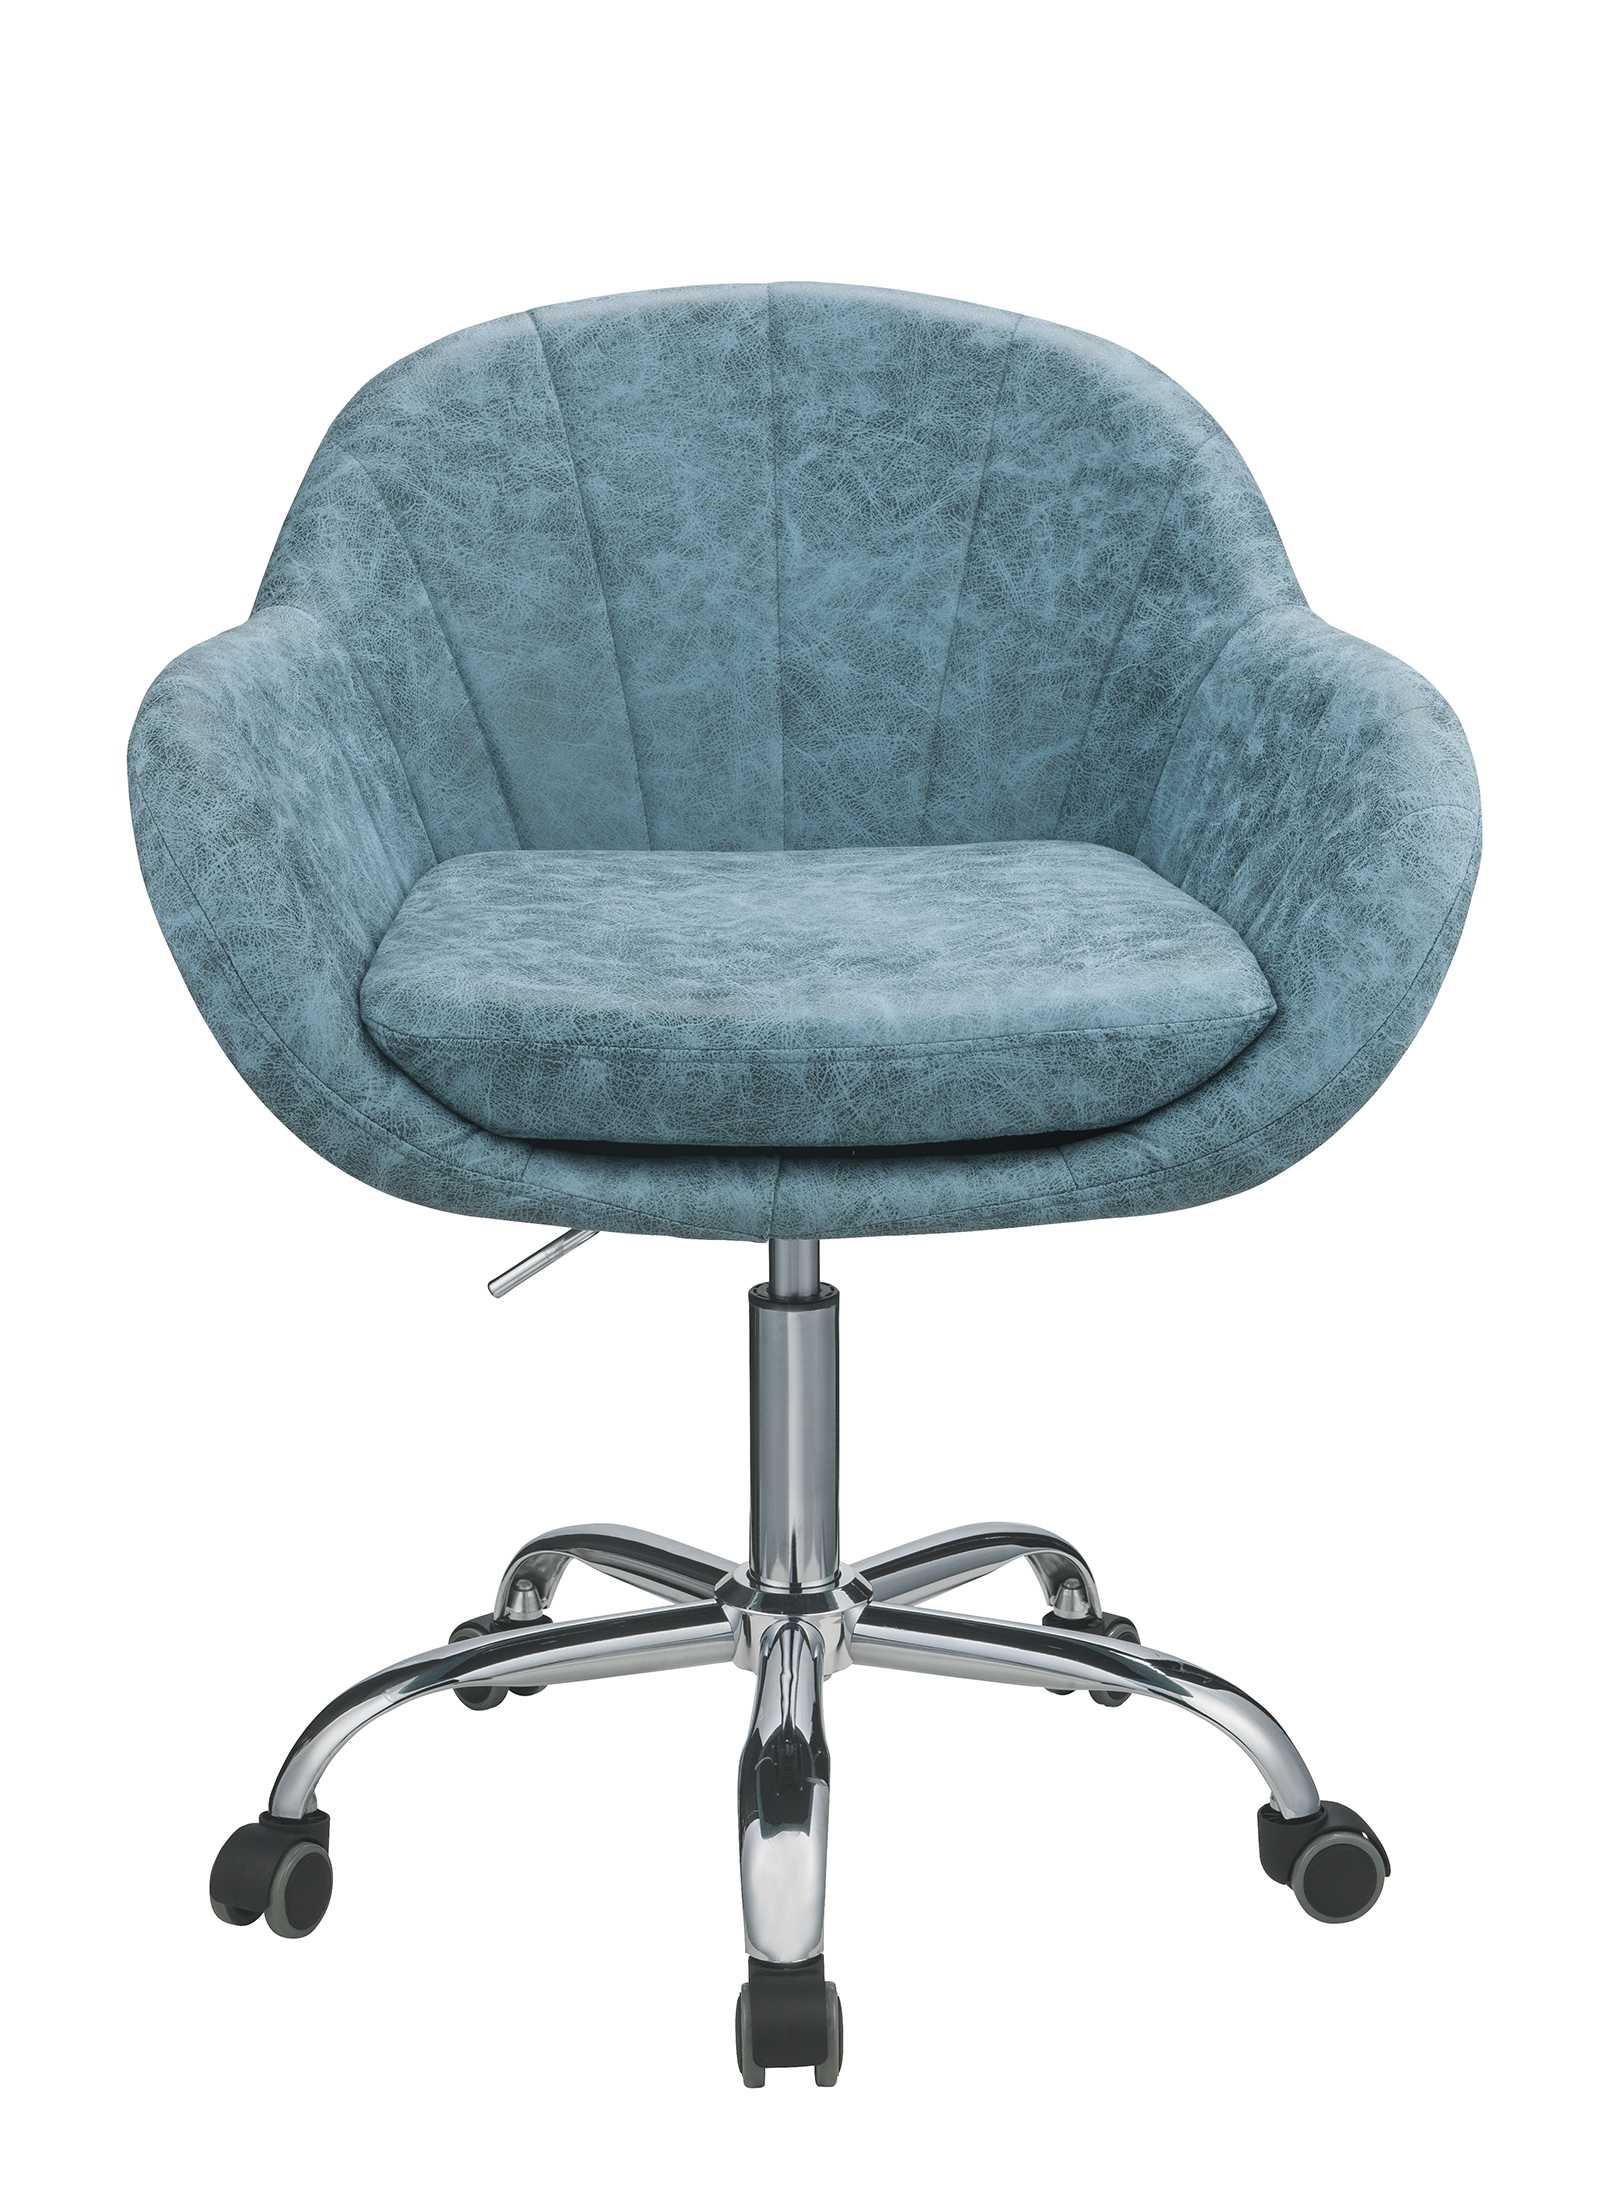 "28"" X 27"" X 31"" Peacock Metal Tube Office Chair"